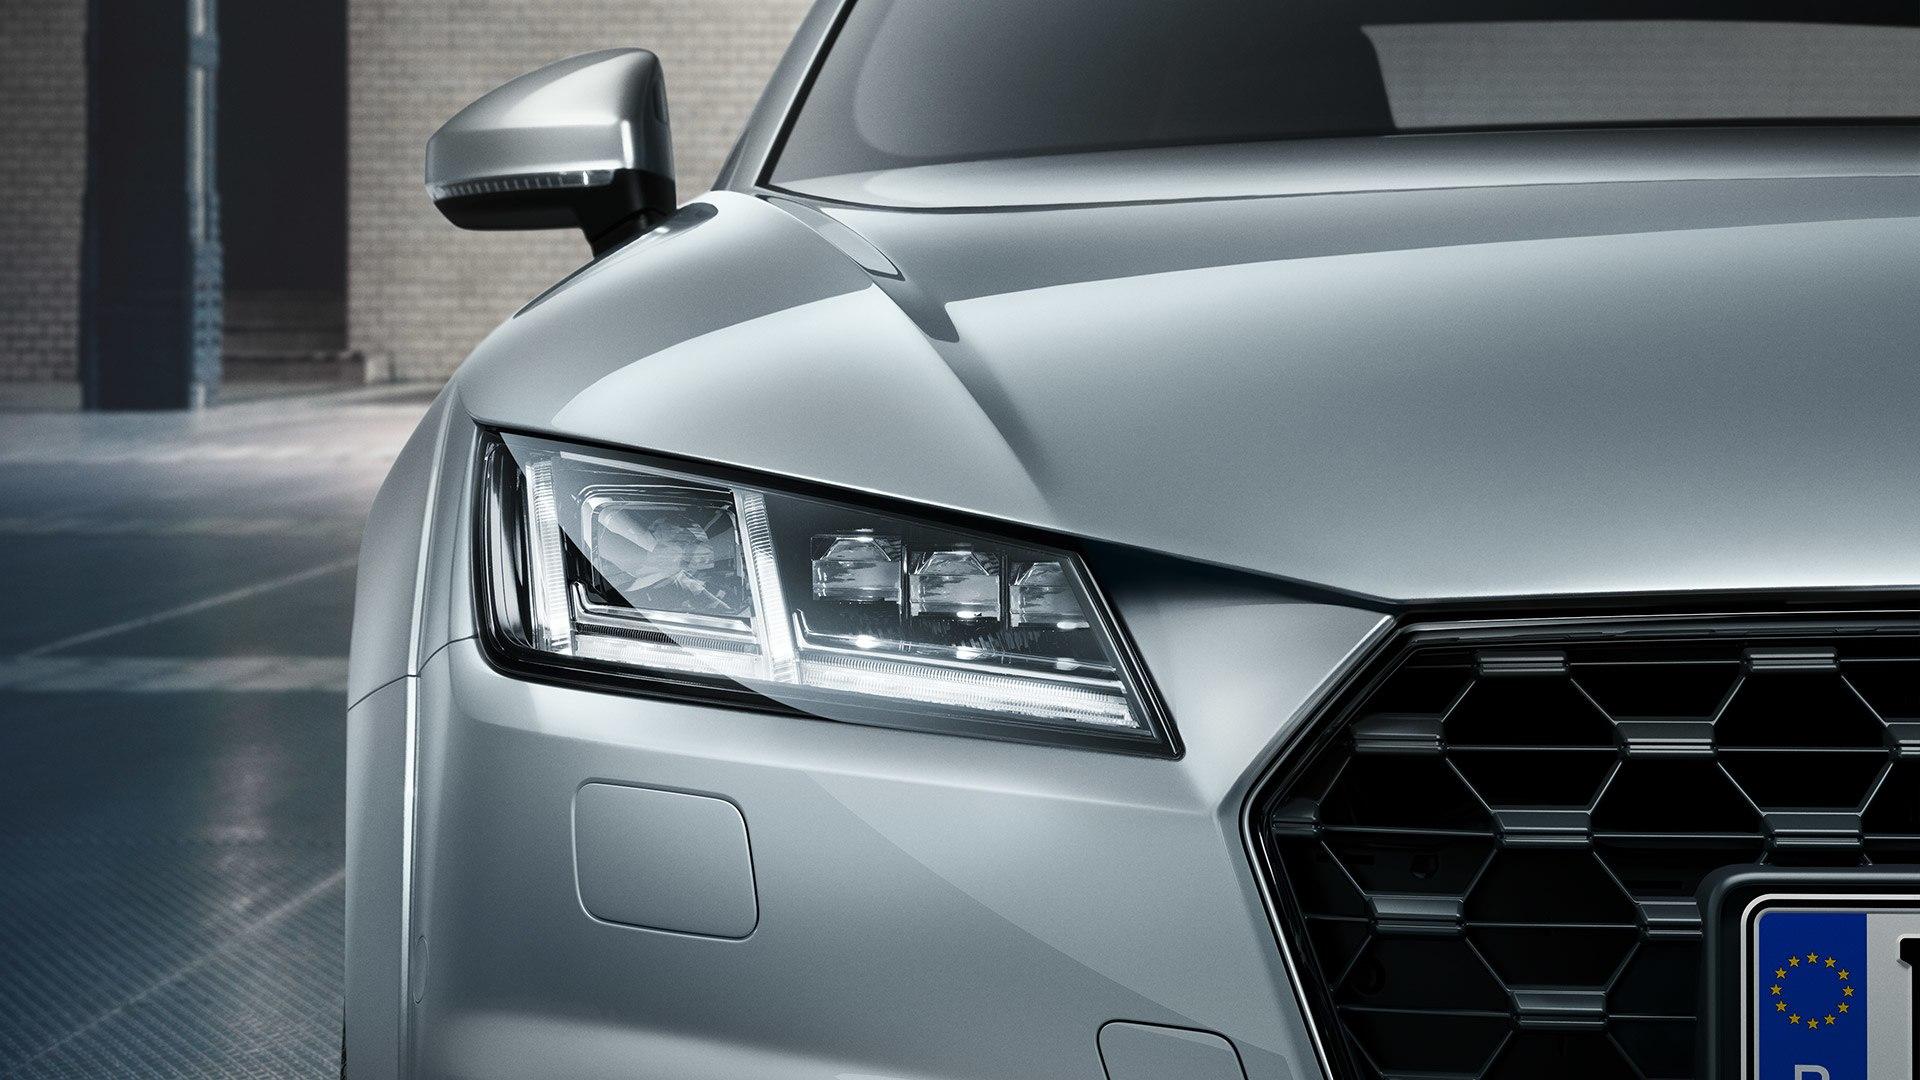 Audi TT koplamp